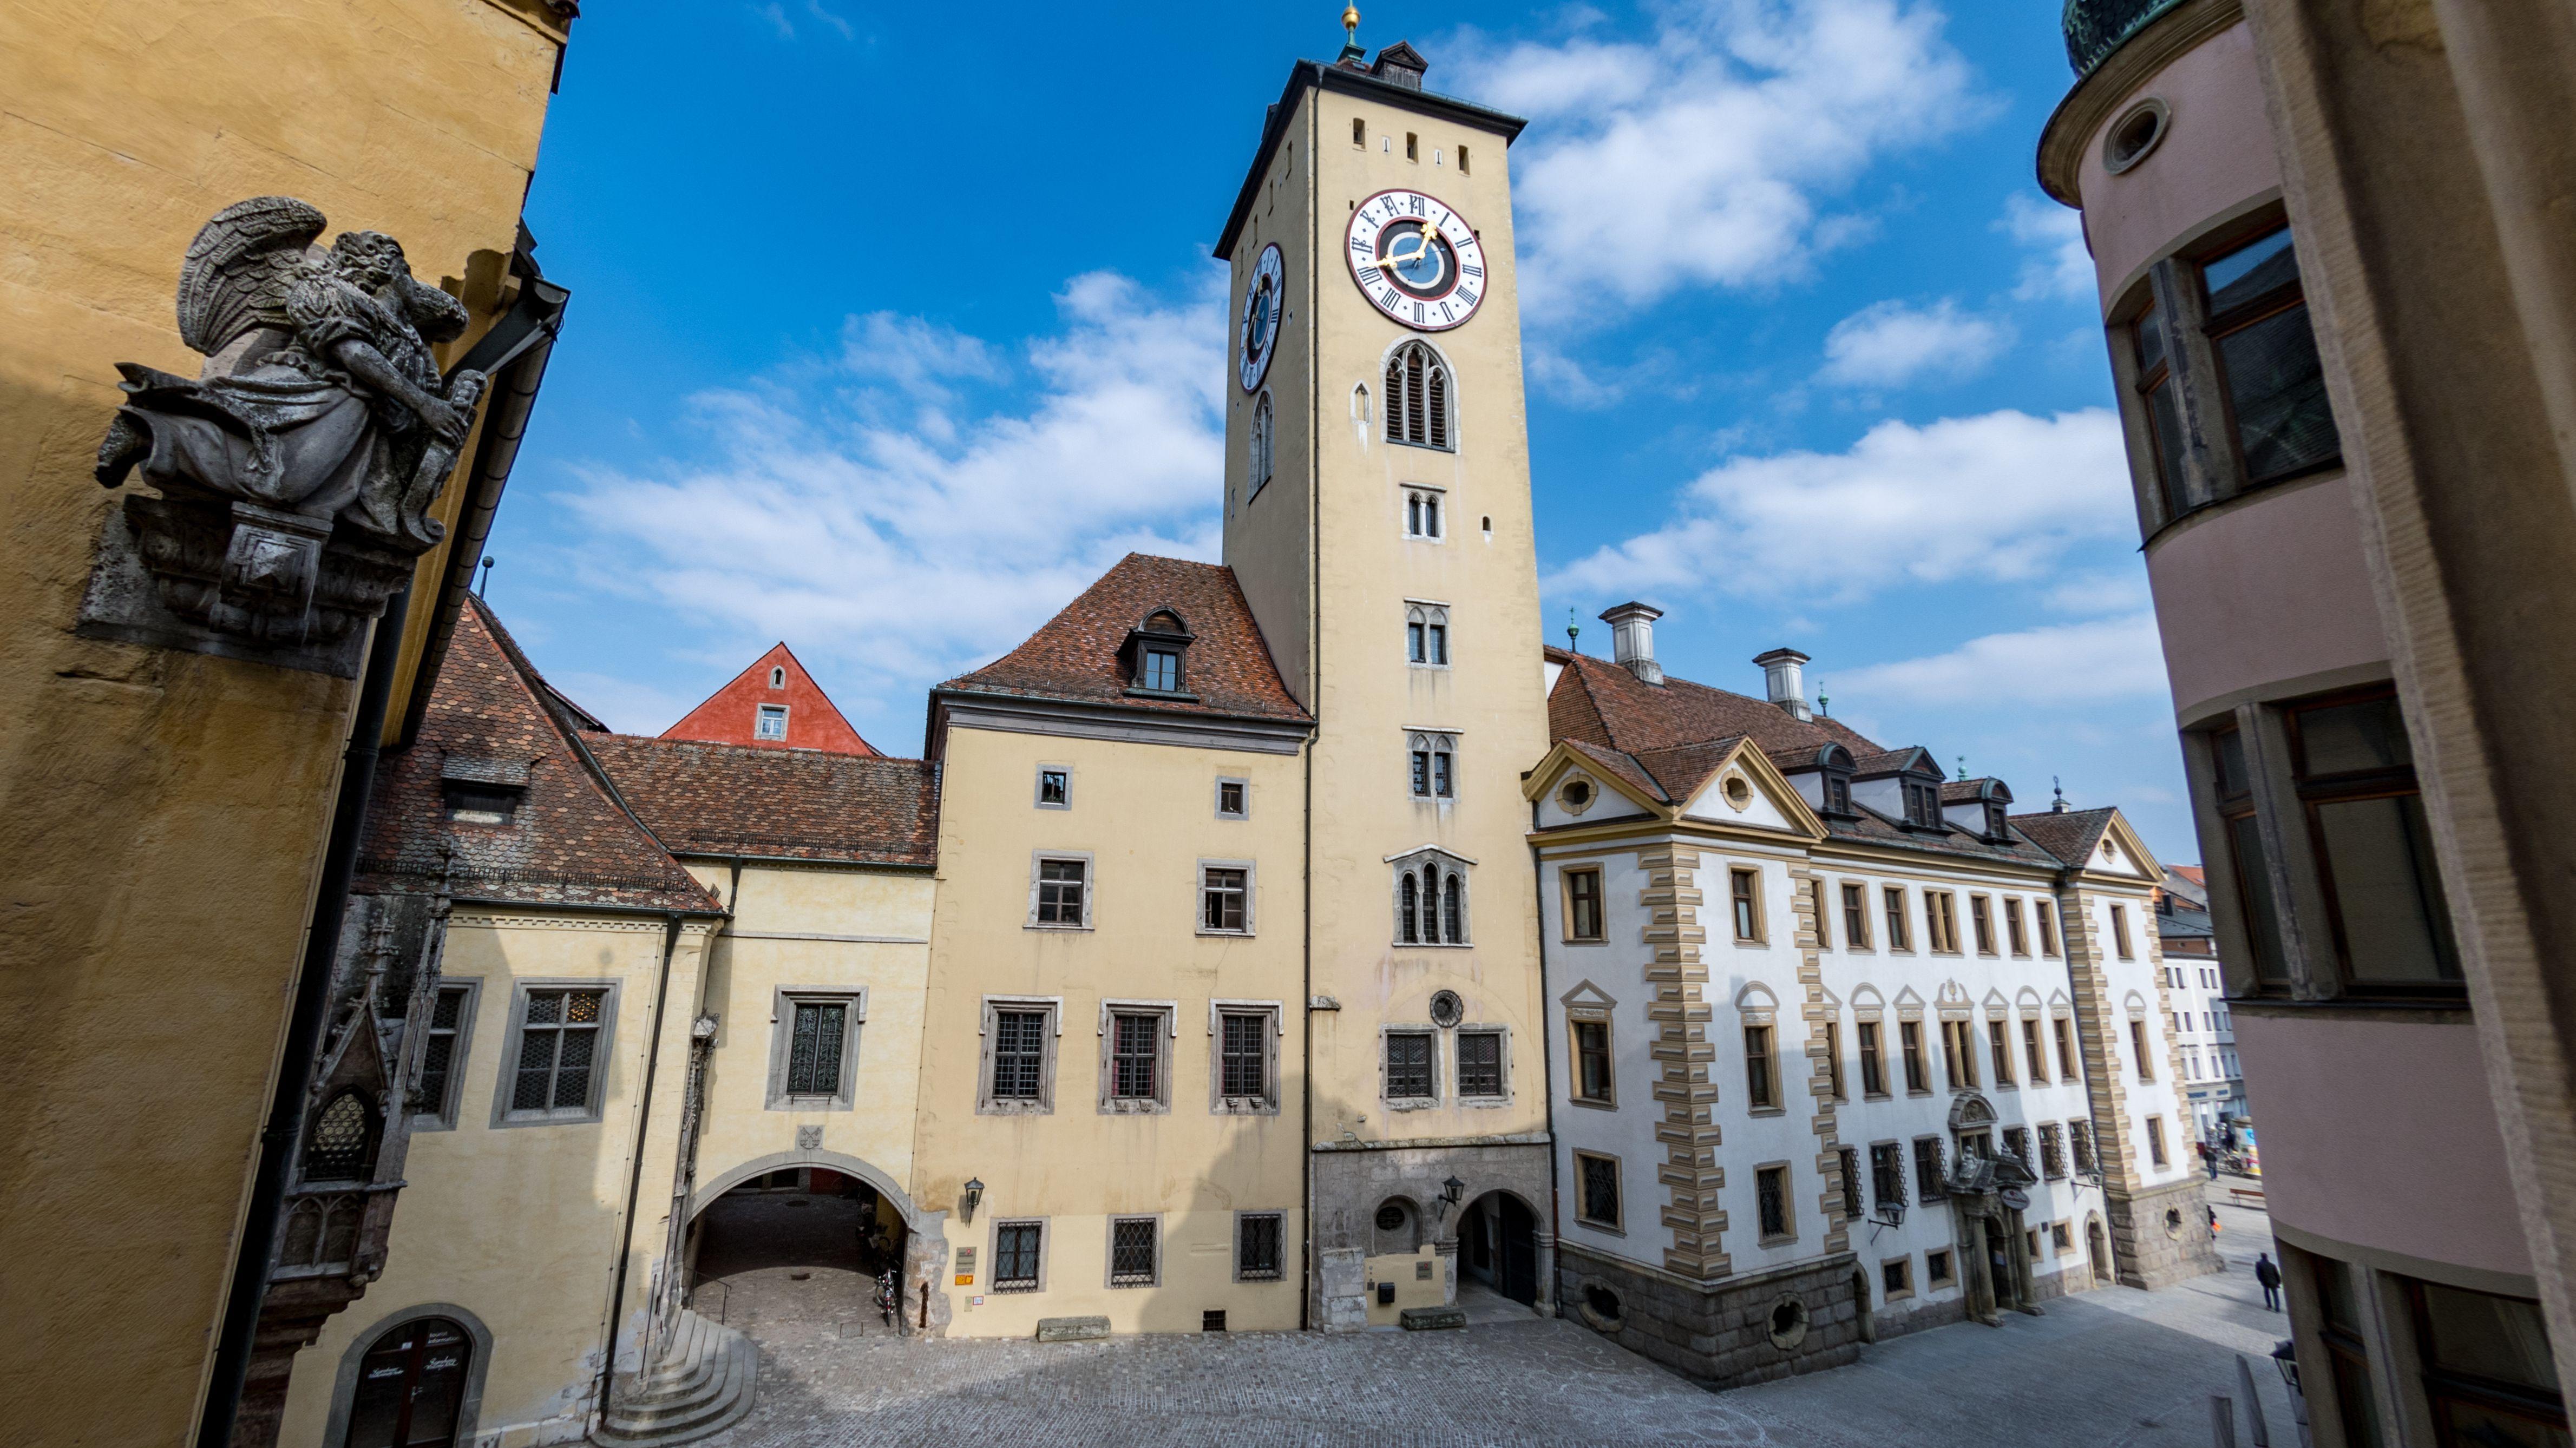 Das Alte Rathaus in Regensburg